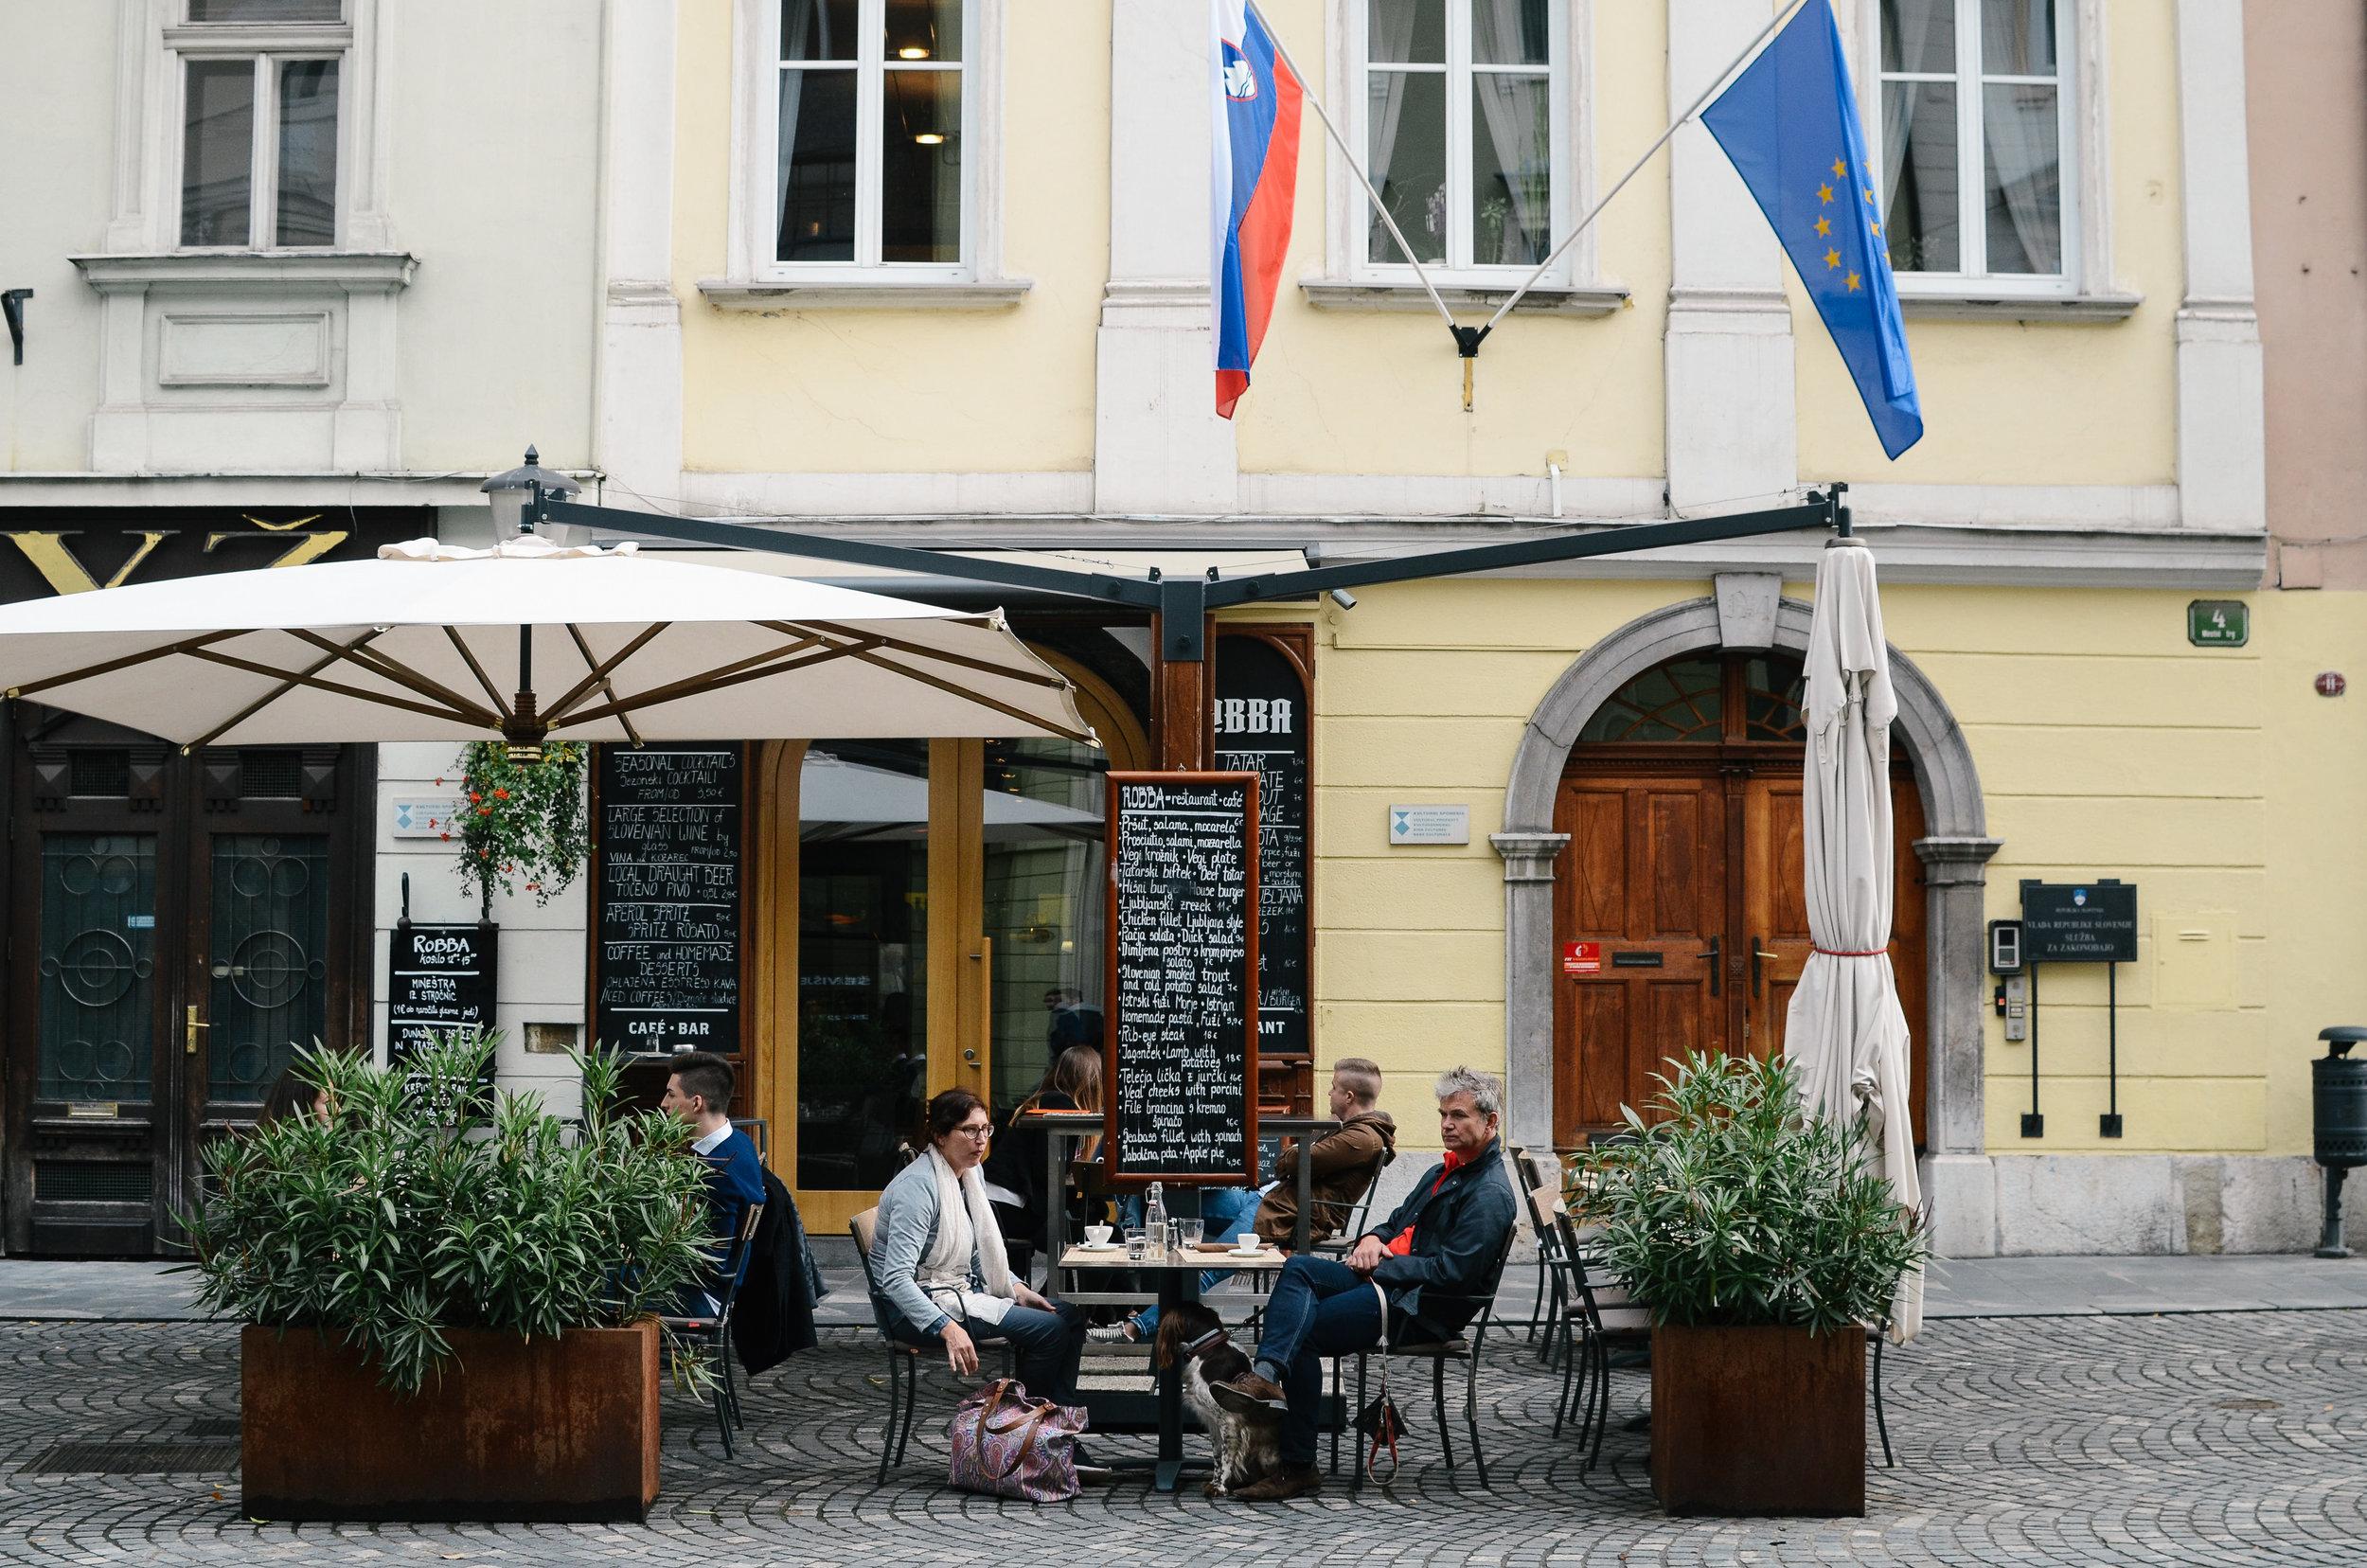 ljubljana-slovenia-travel-guide-lifeonpine_DSC_1795.jpg